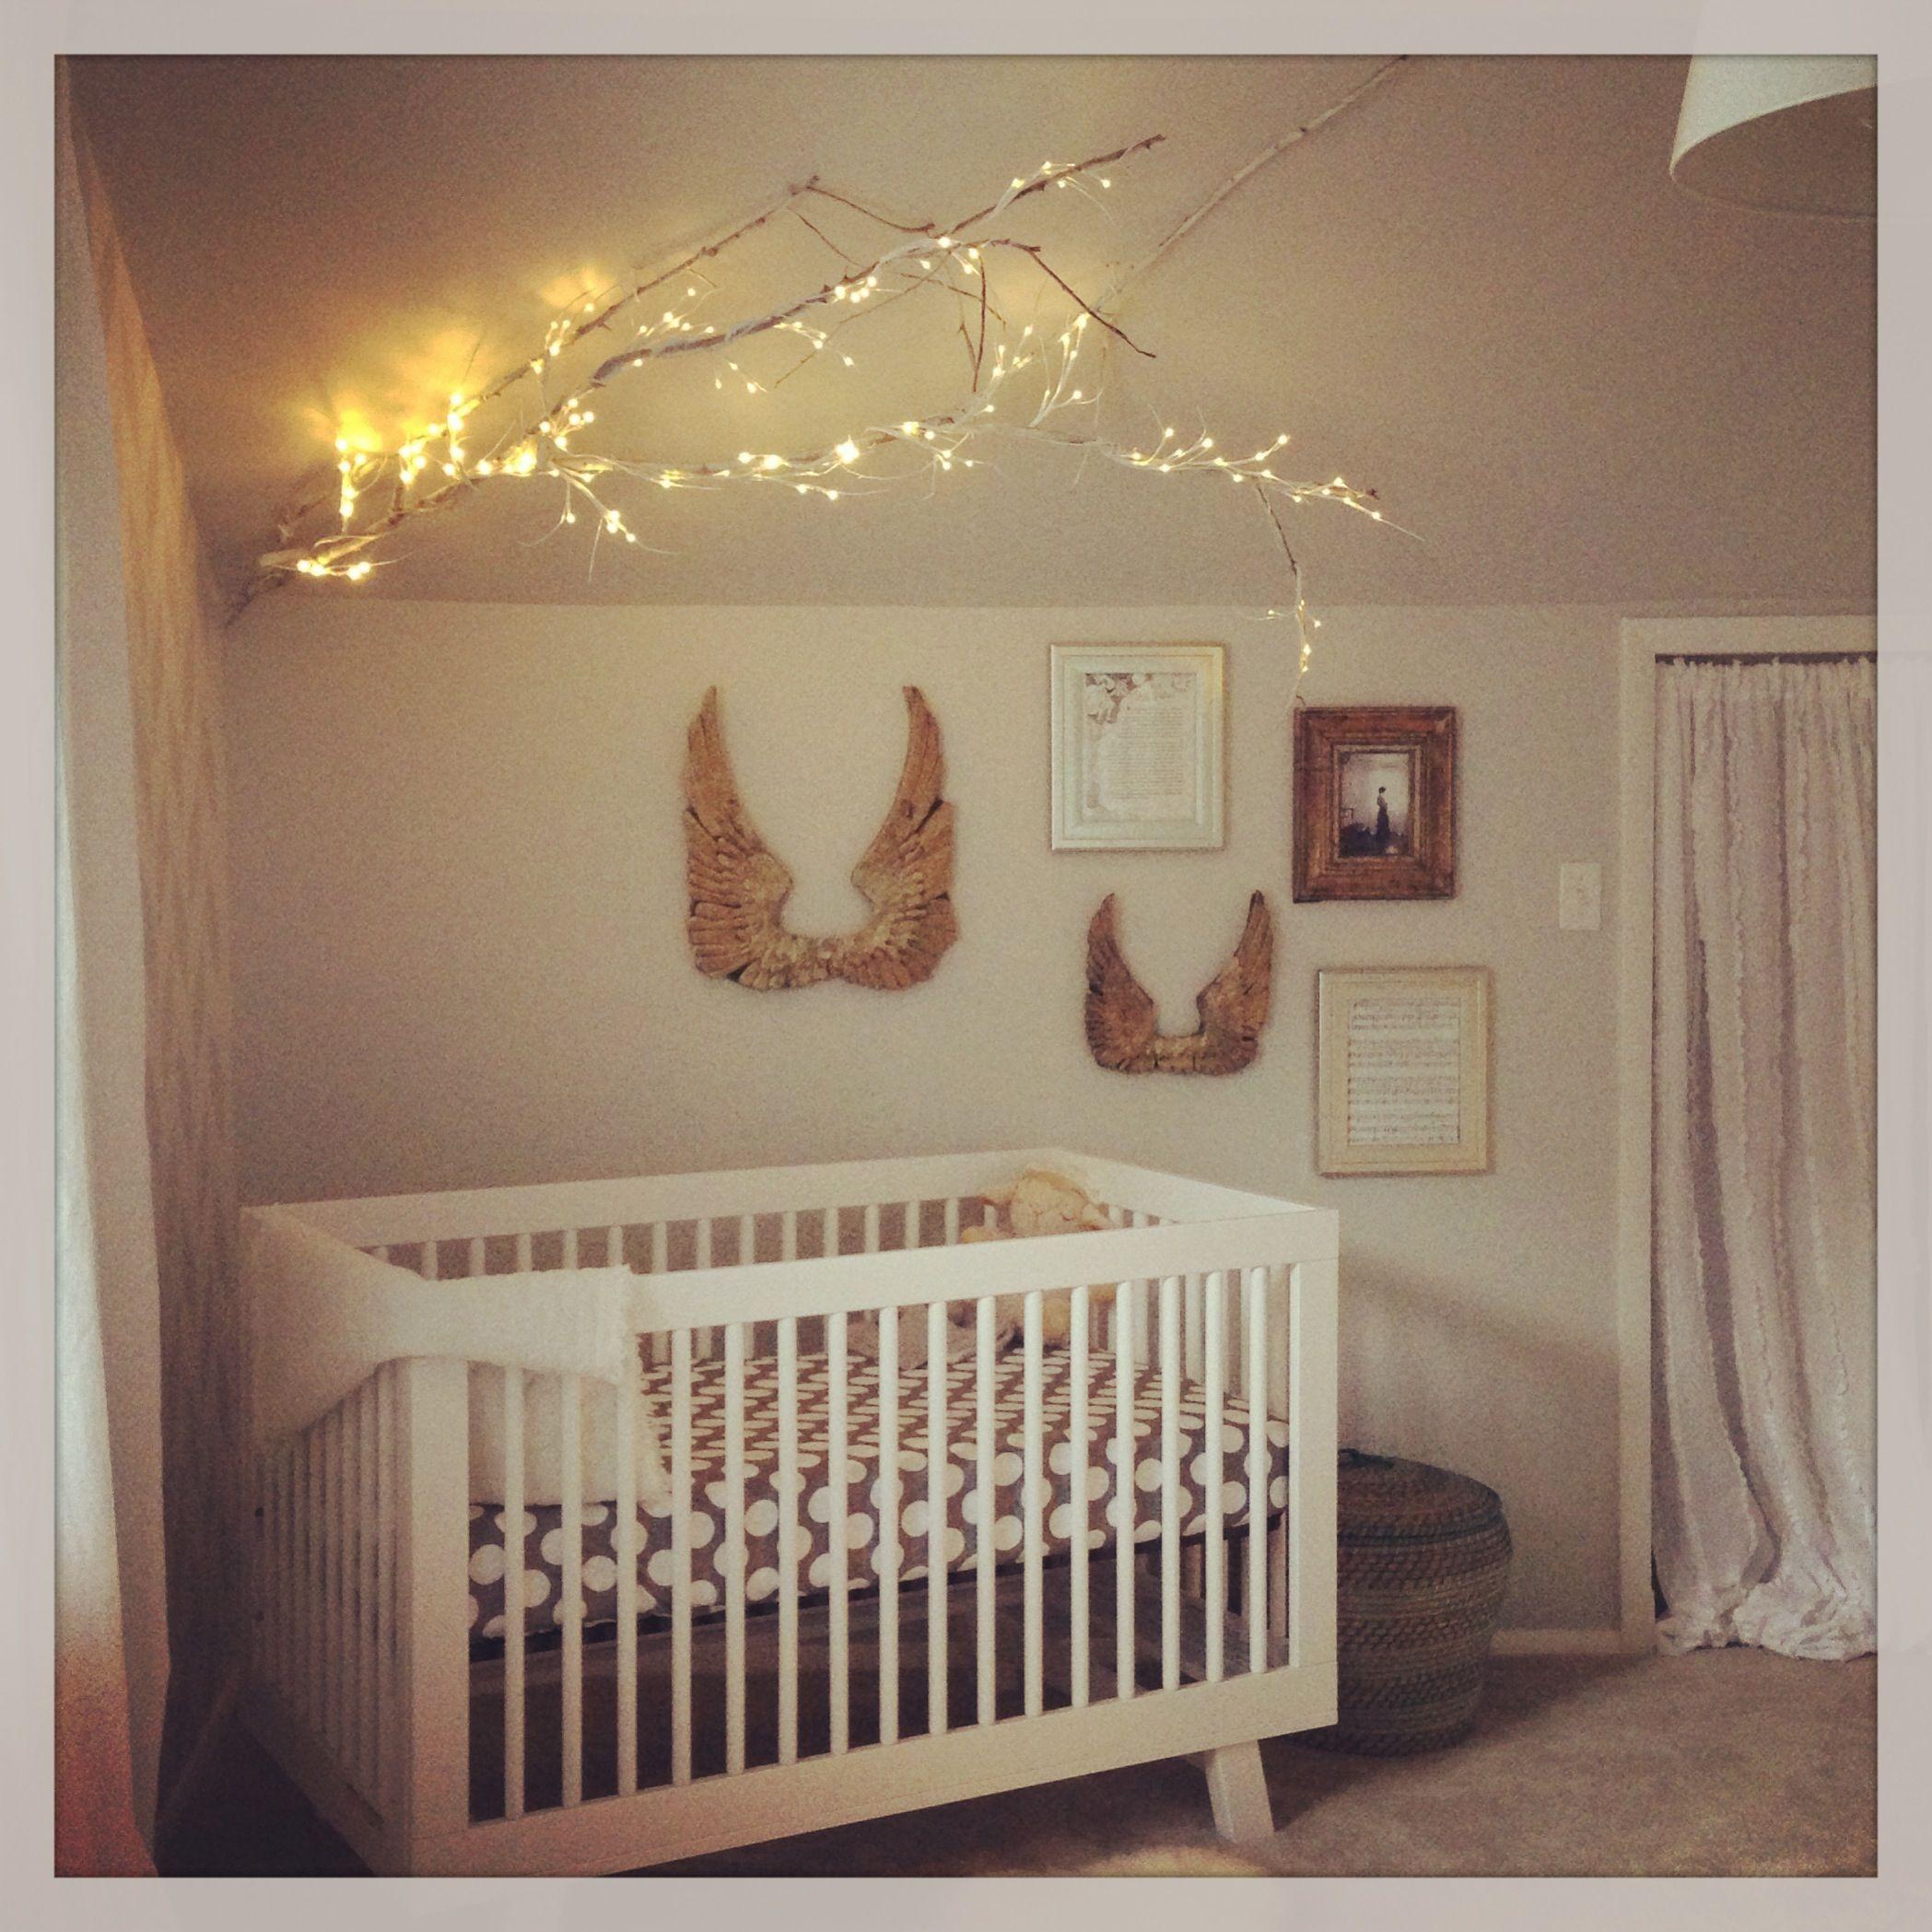 Fabulous Unisex Nursery Decorating Ideas: Vintage Chic Unisex Nursery Decor With Modern Crib, Land